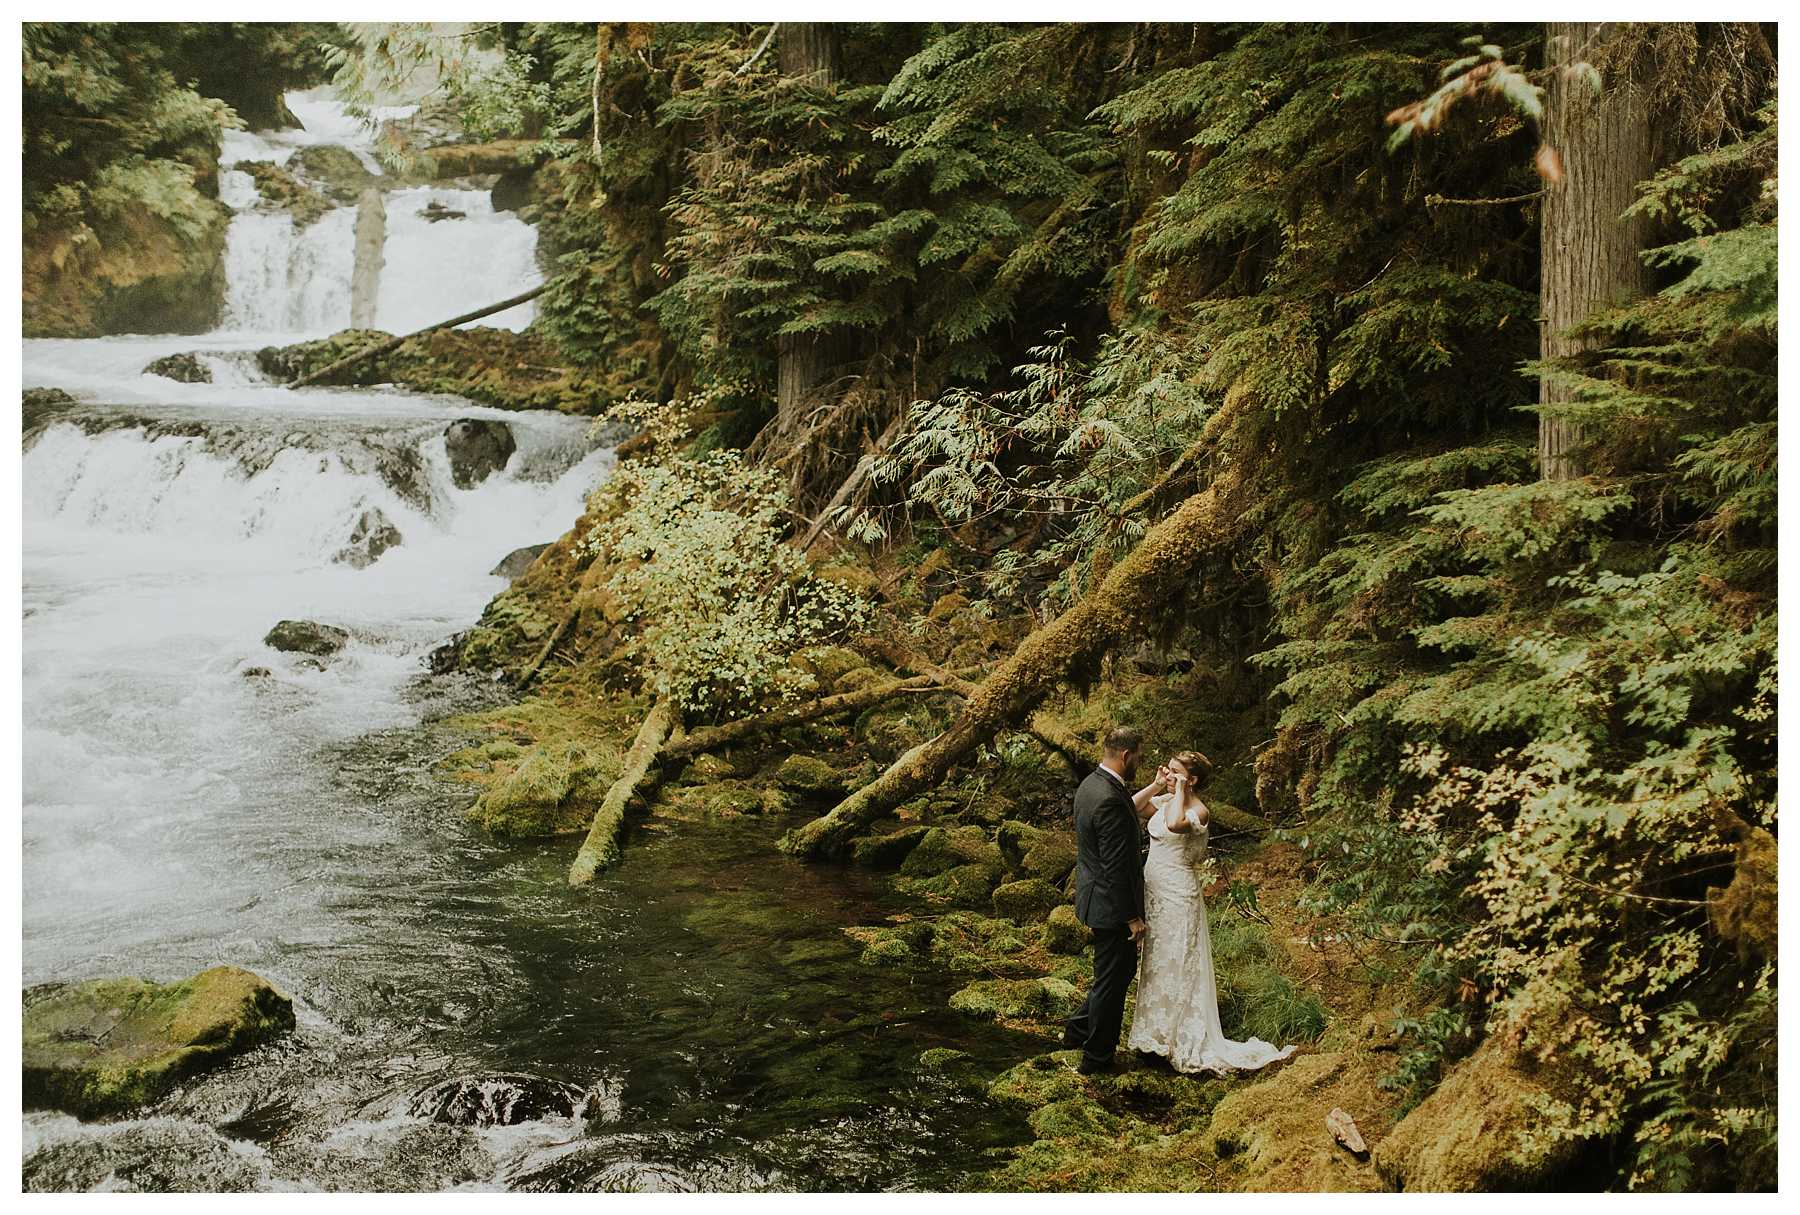 Oregon_Waterfall_Elopement_0032.jpg